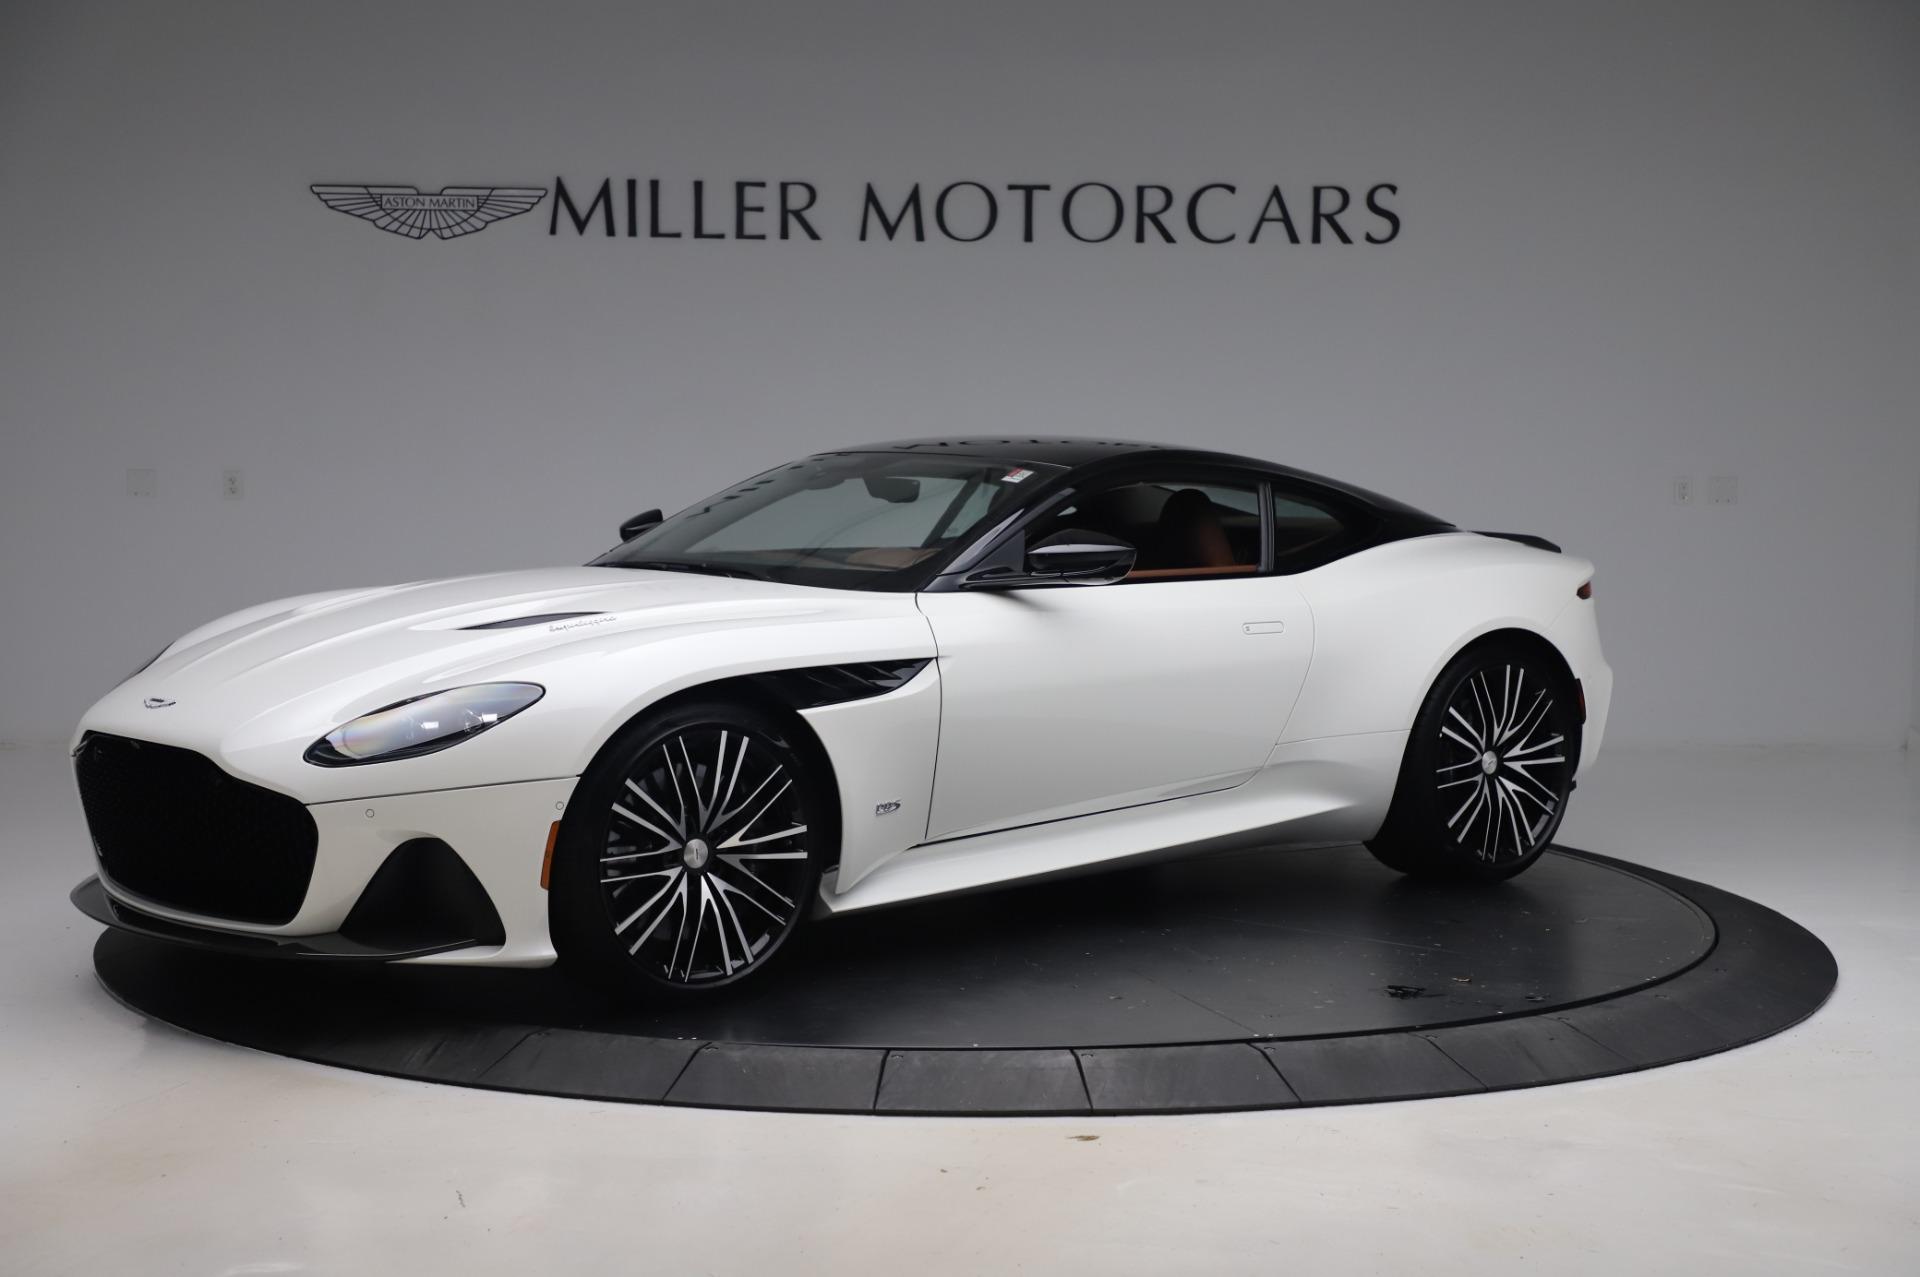 New 2020 Aston Martin DBS Superleggera for sale $337,686 at Aston Martin of Greenwich in Greenwich CT 06830 1